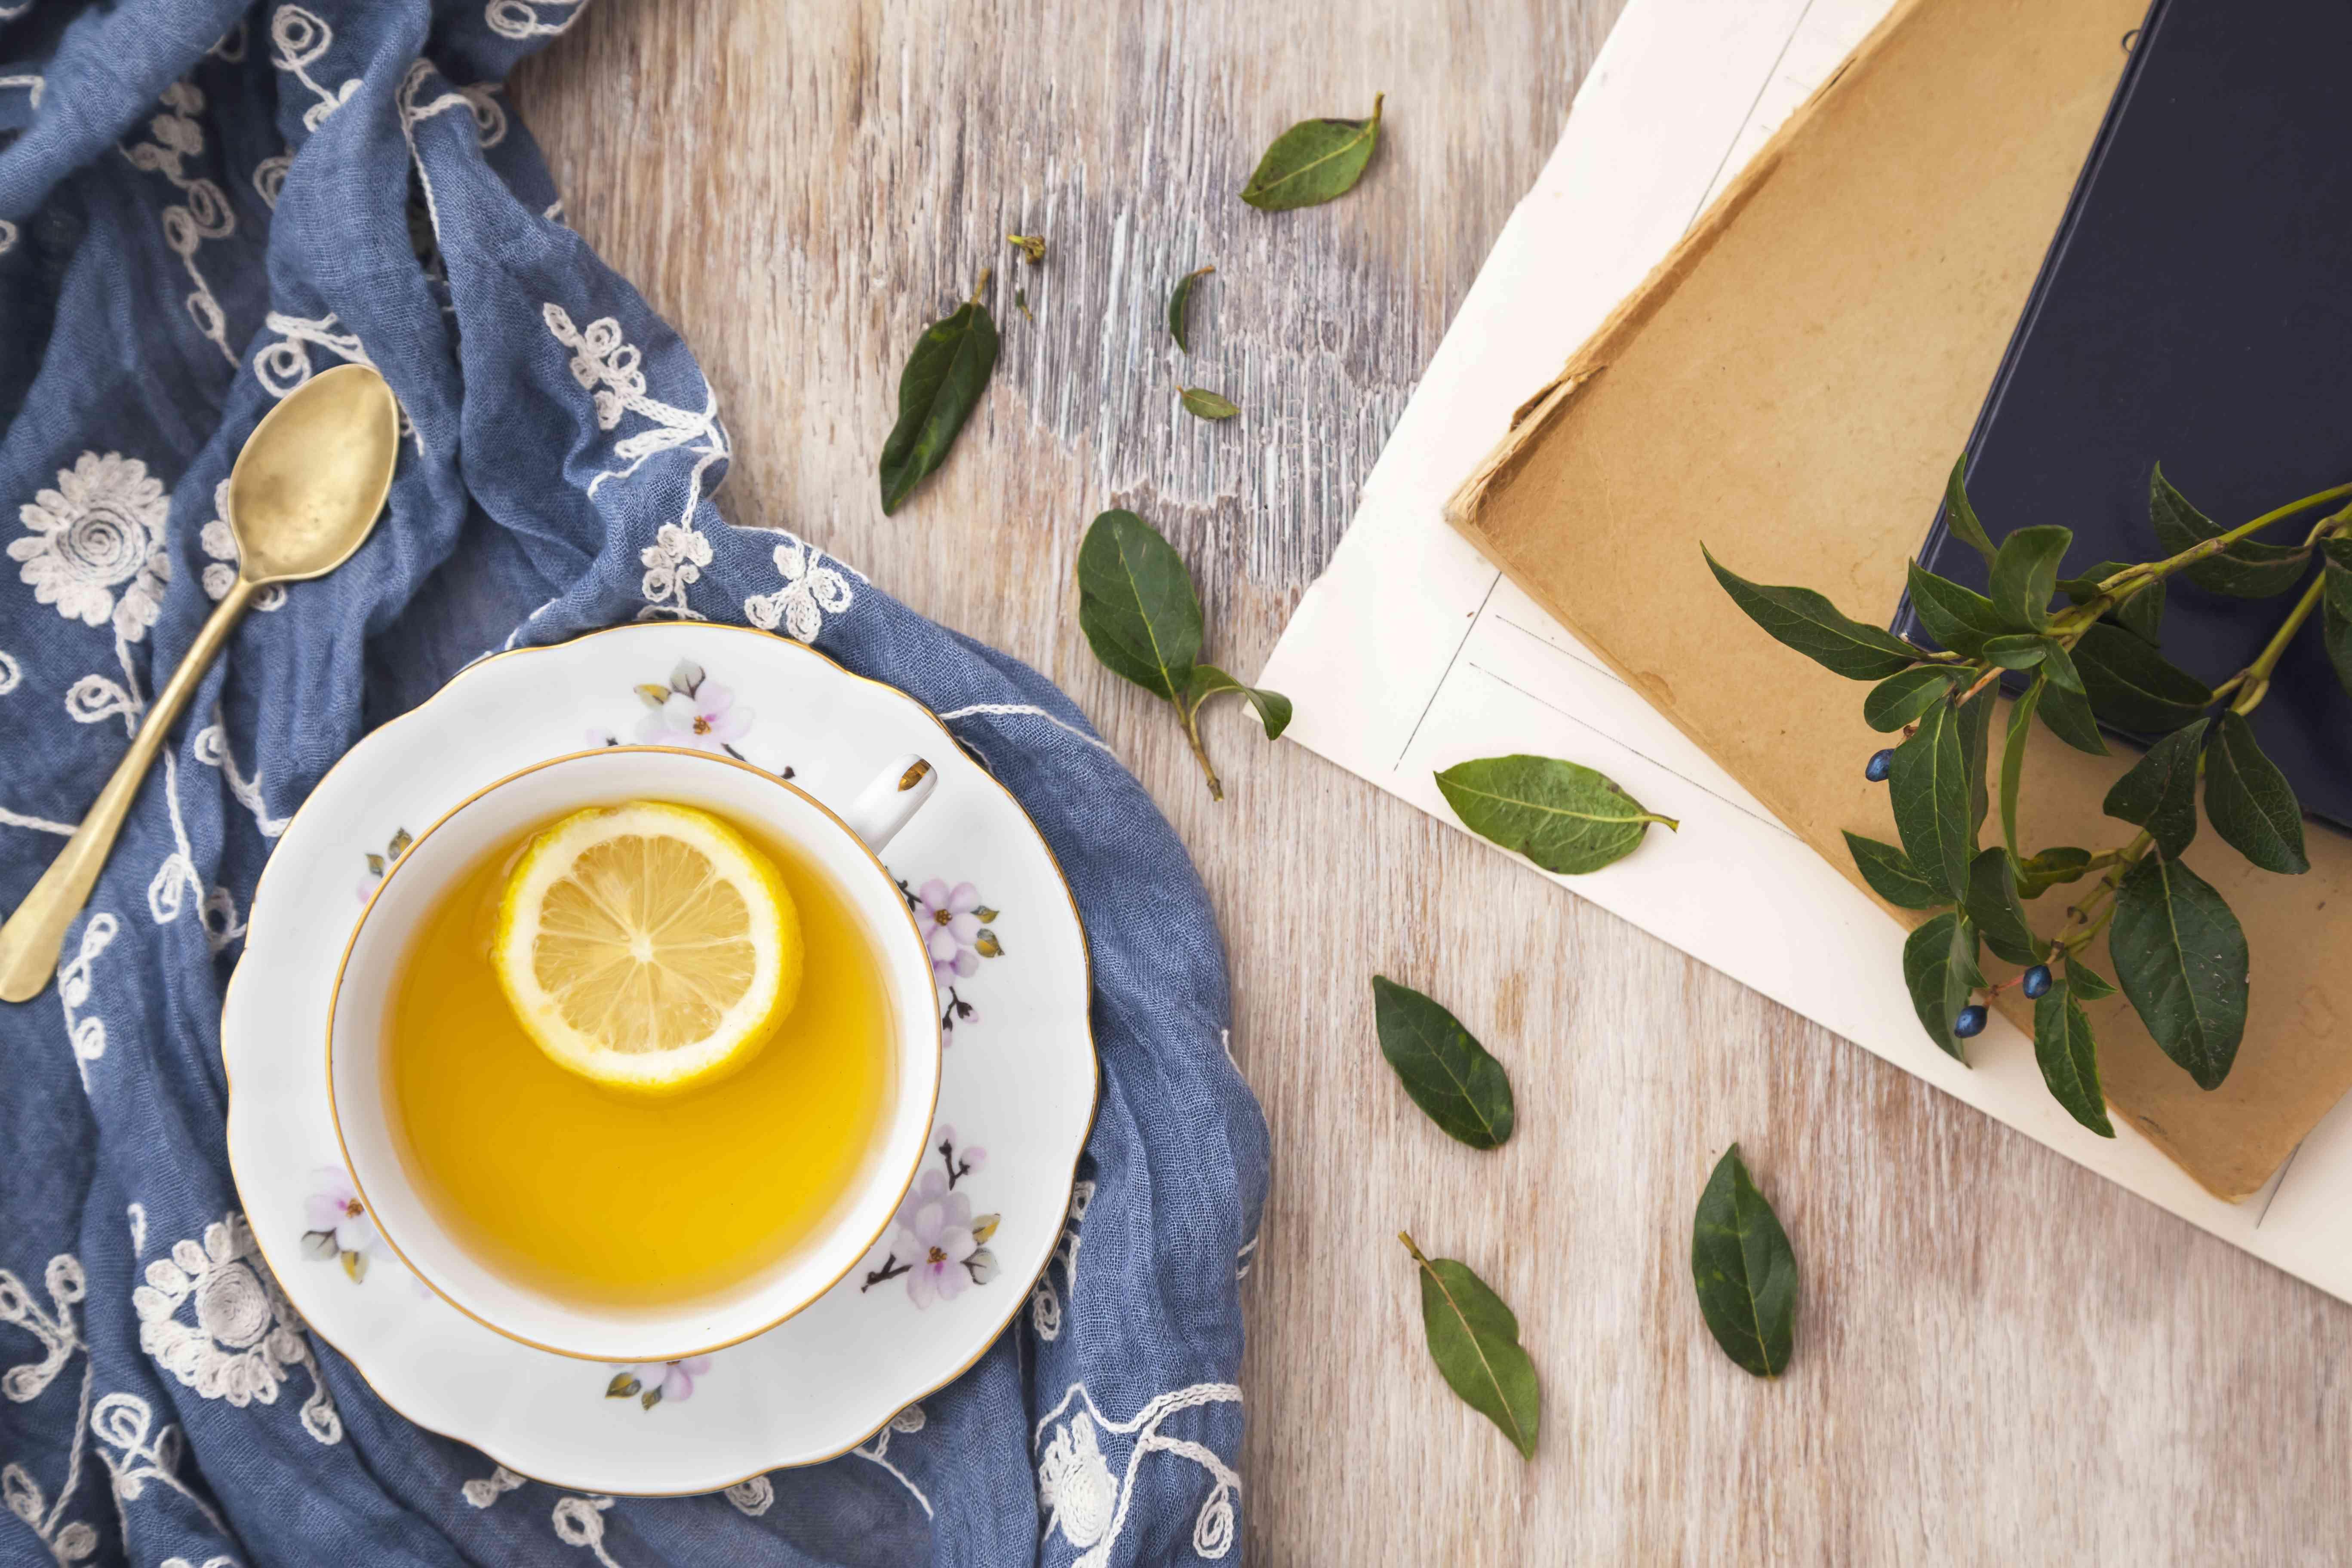 Cup of green tea with lemon slice